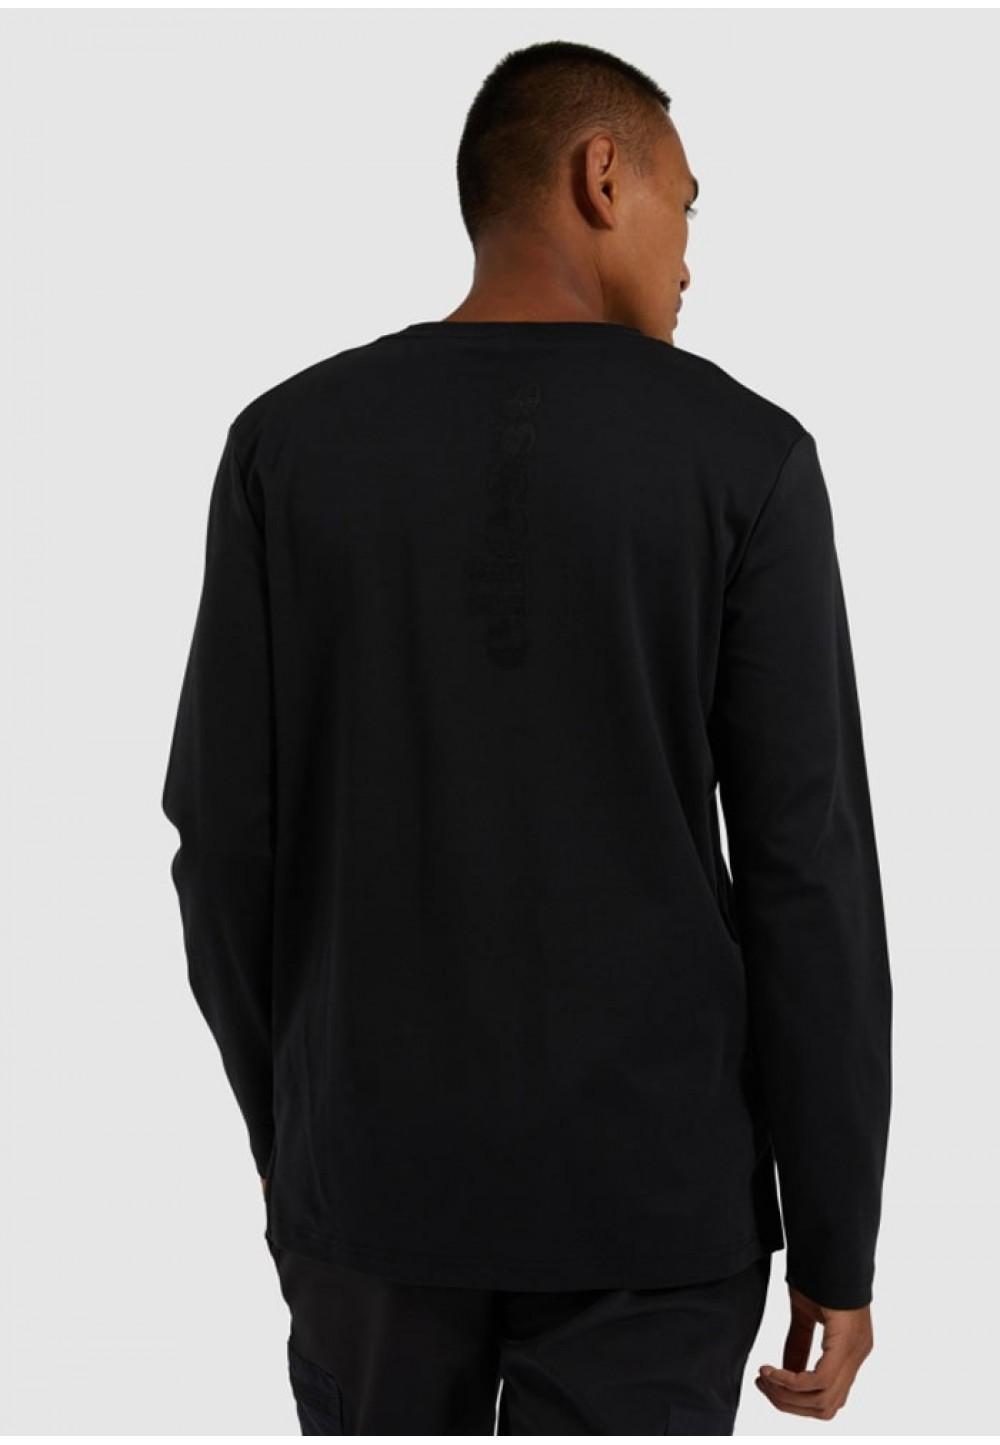 Легкая черная мужская кофта